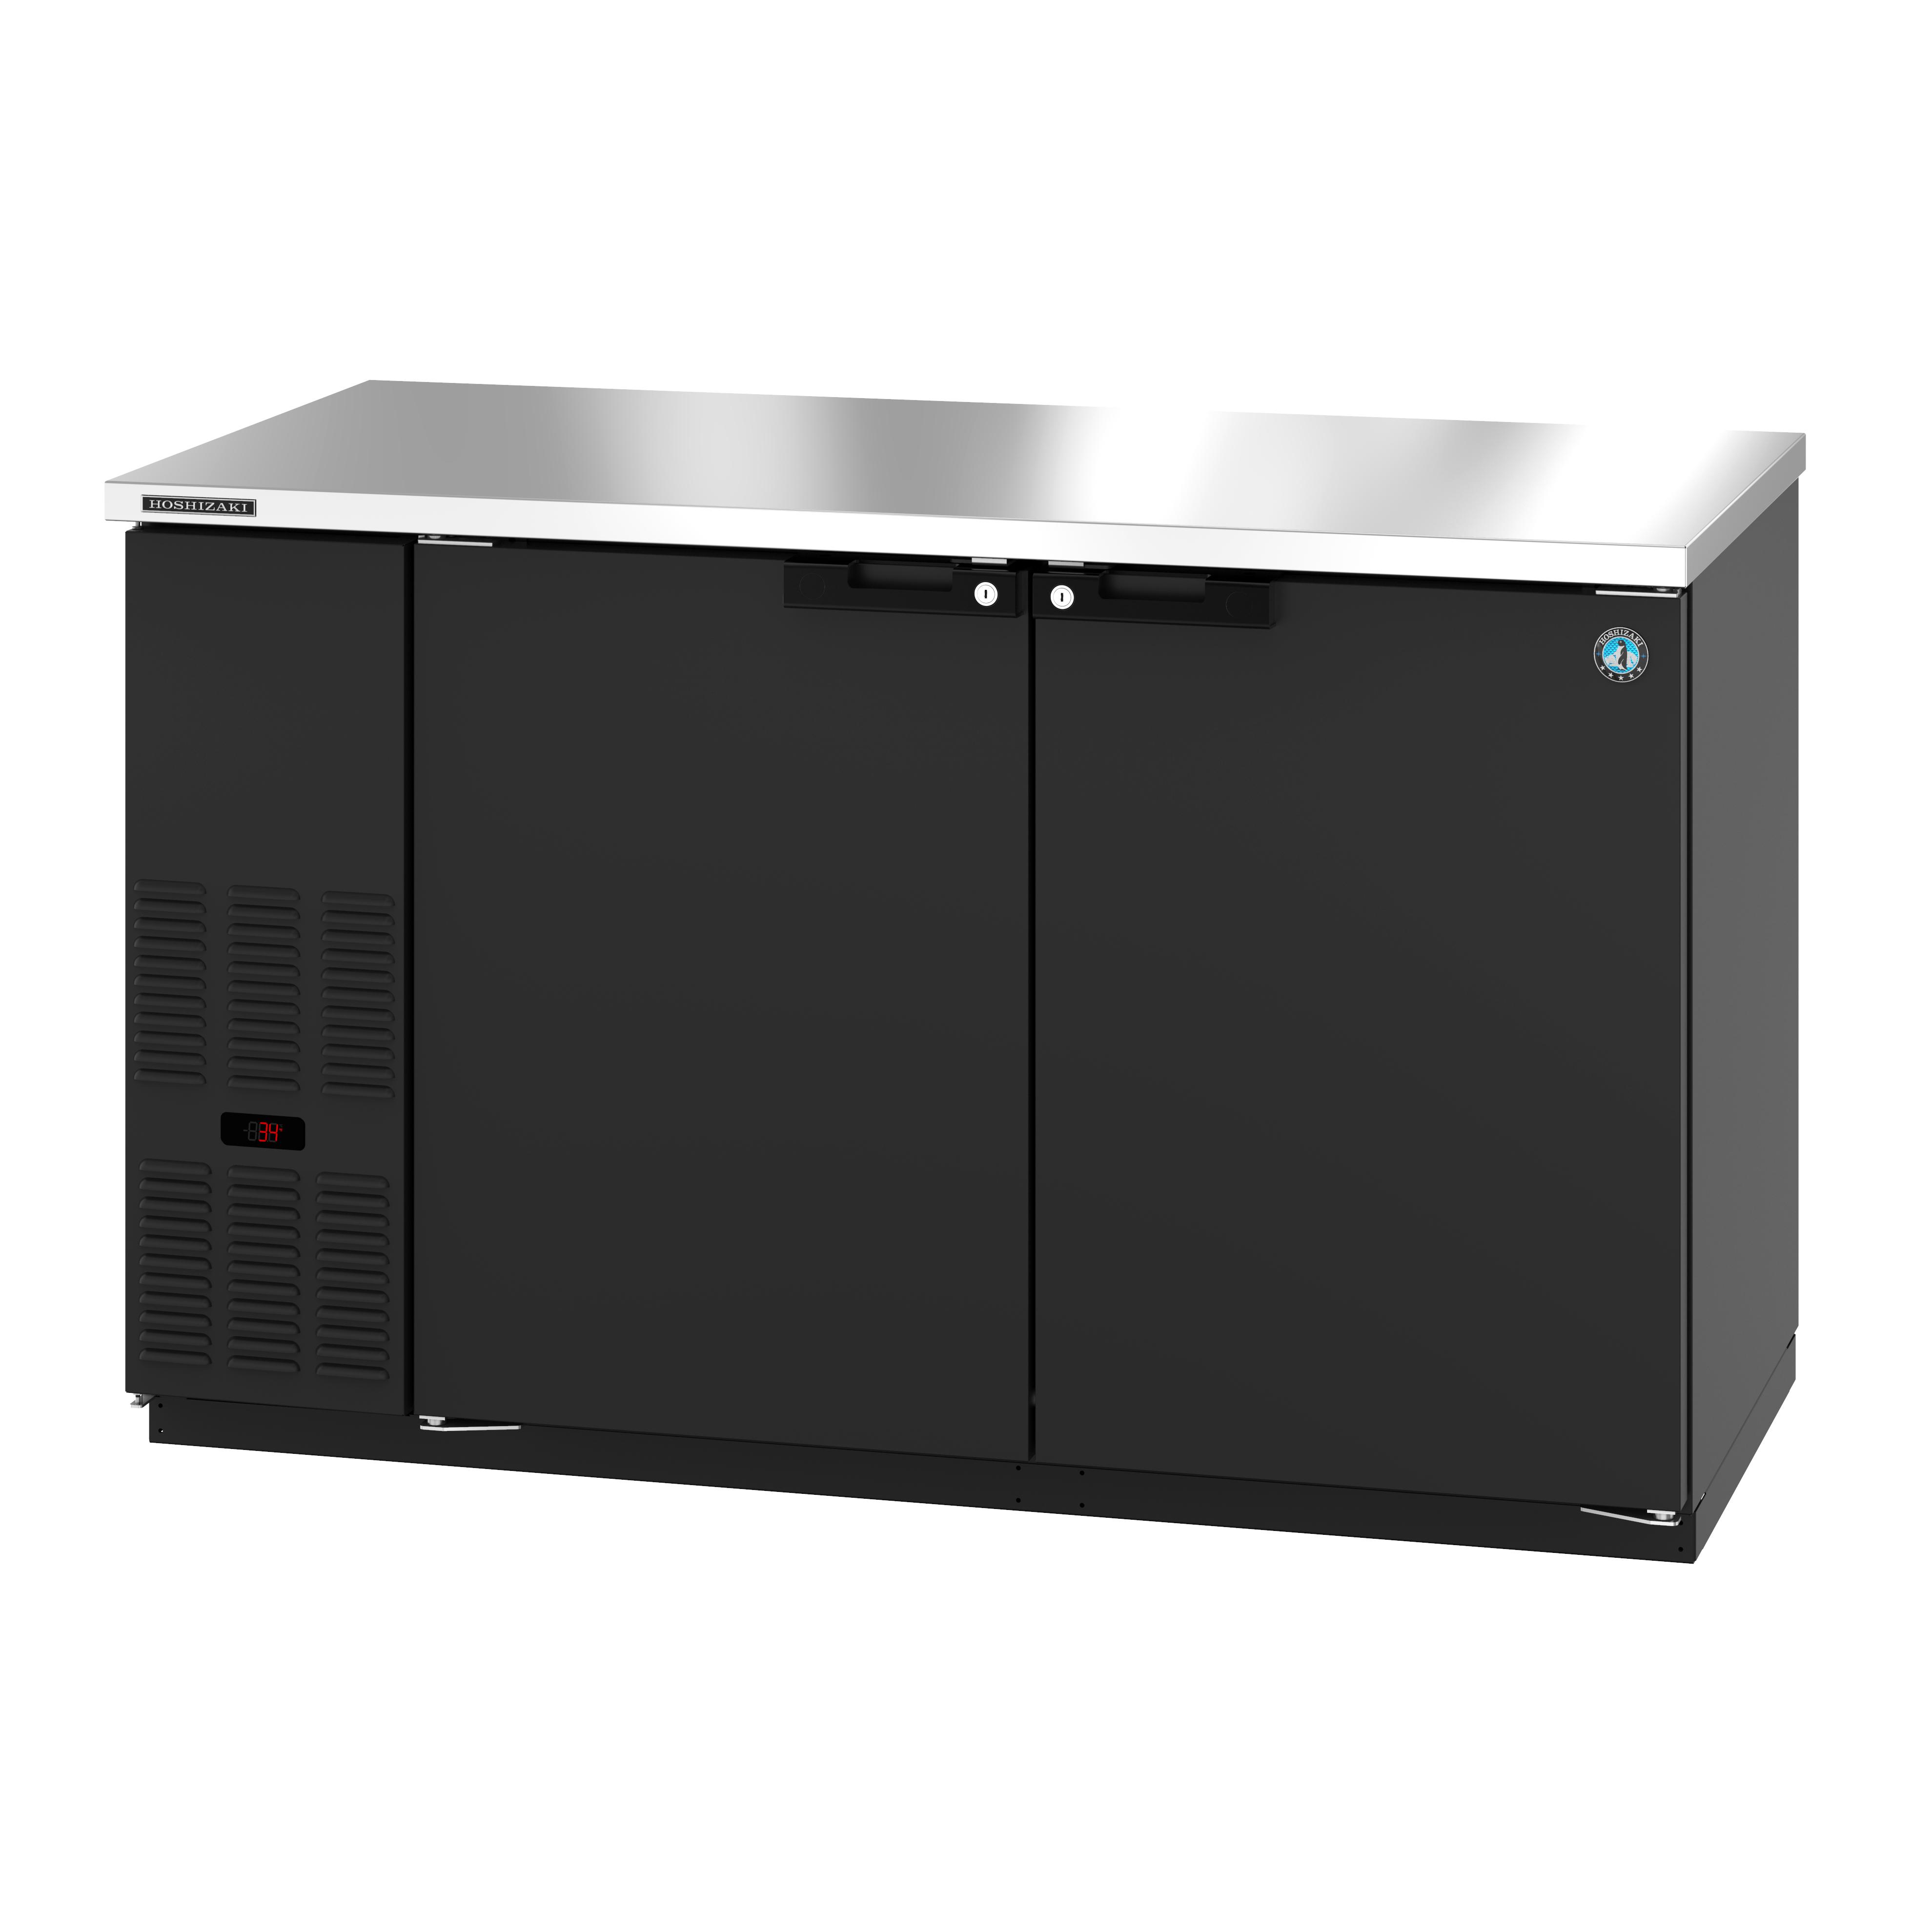 Hoshizaki BB59 underbar equipment/refrigeration